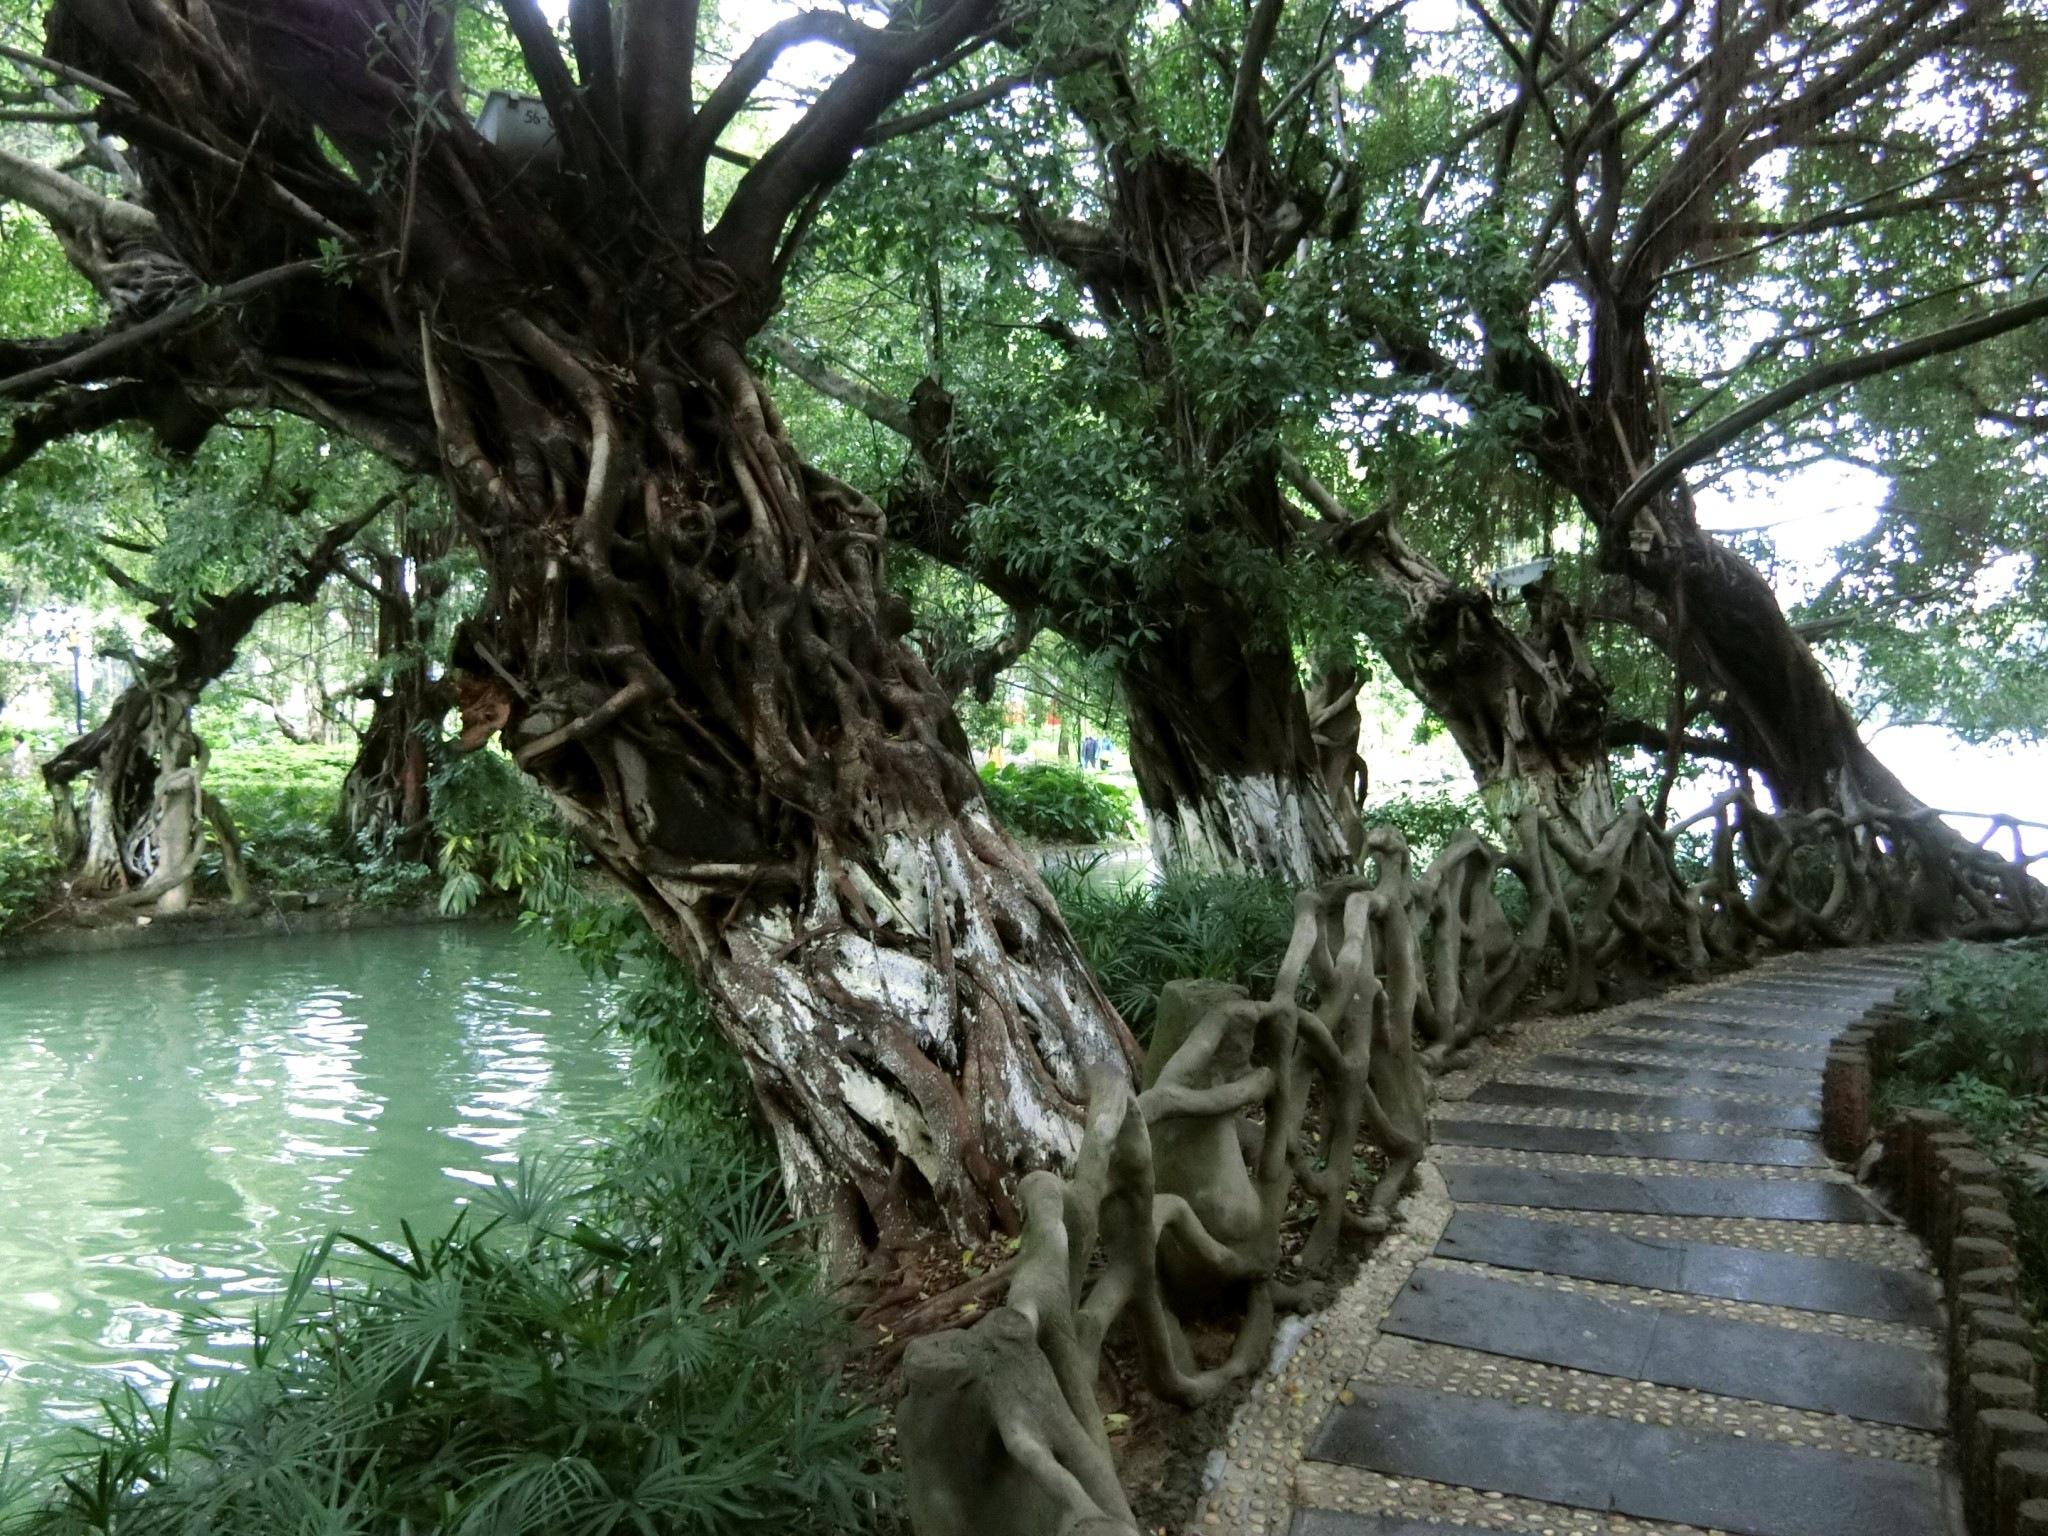 Lake Rong walkway, Guilin by pop88123